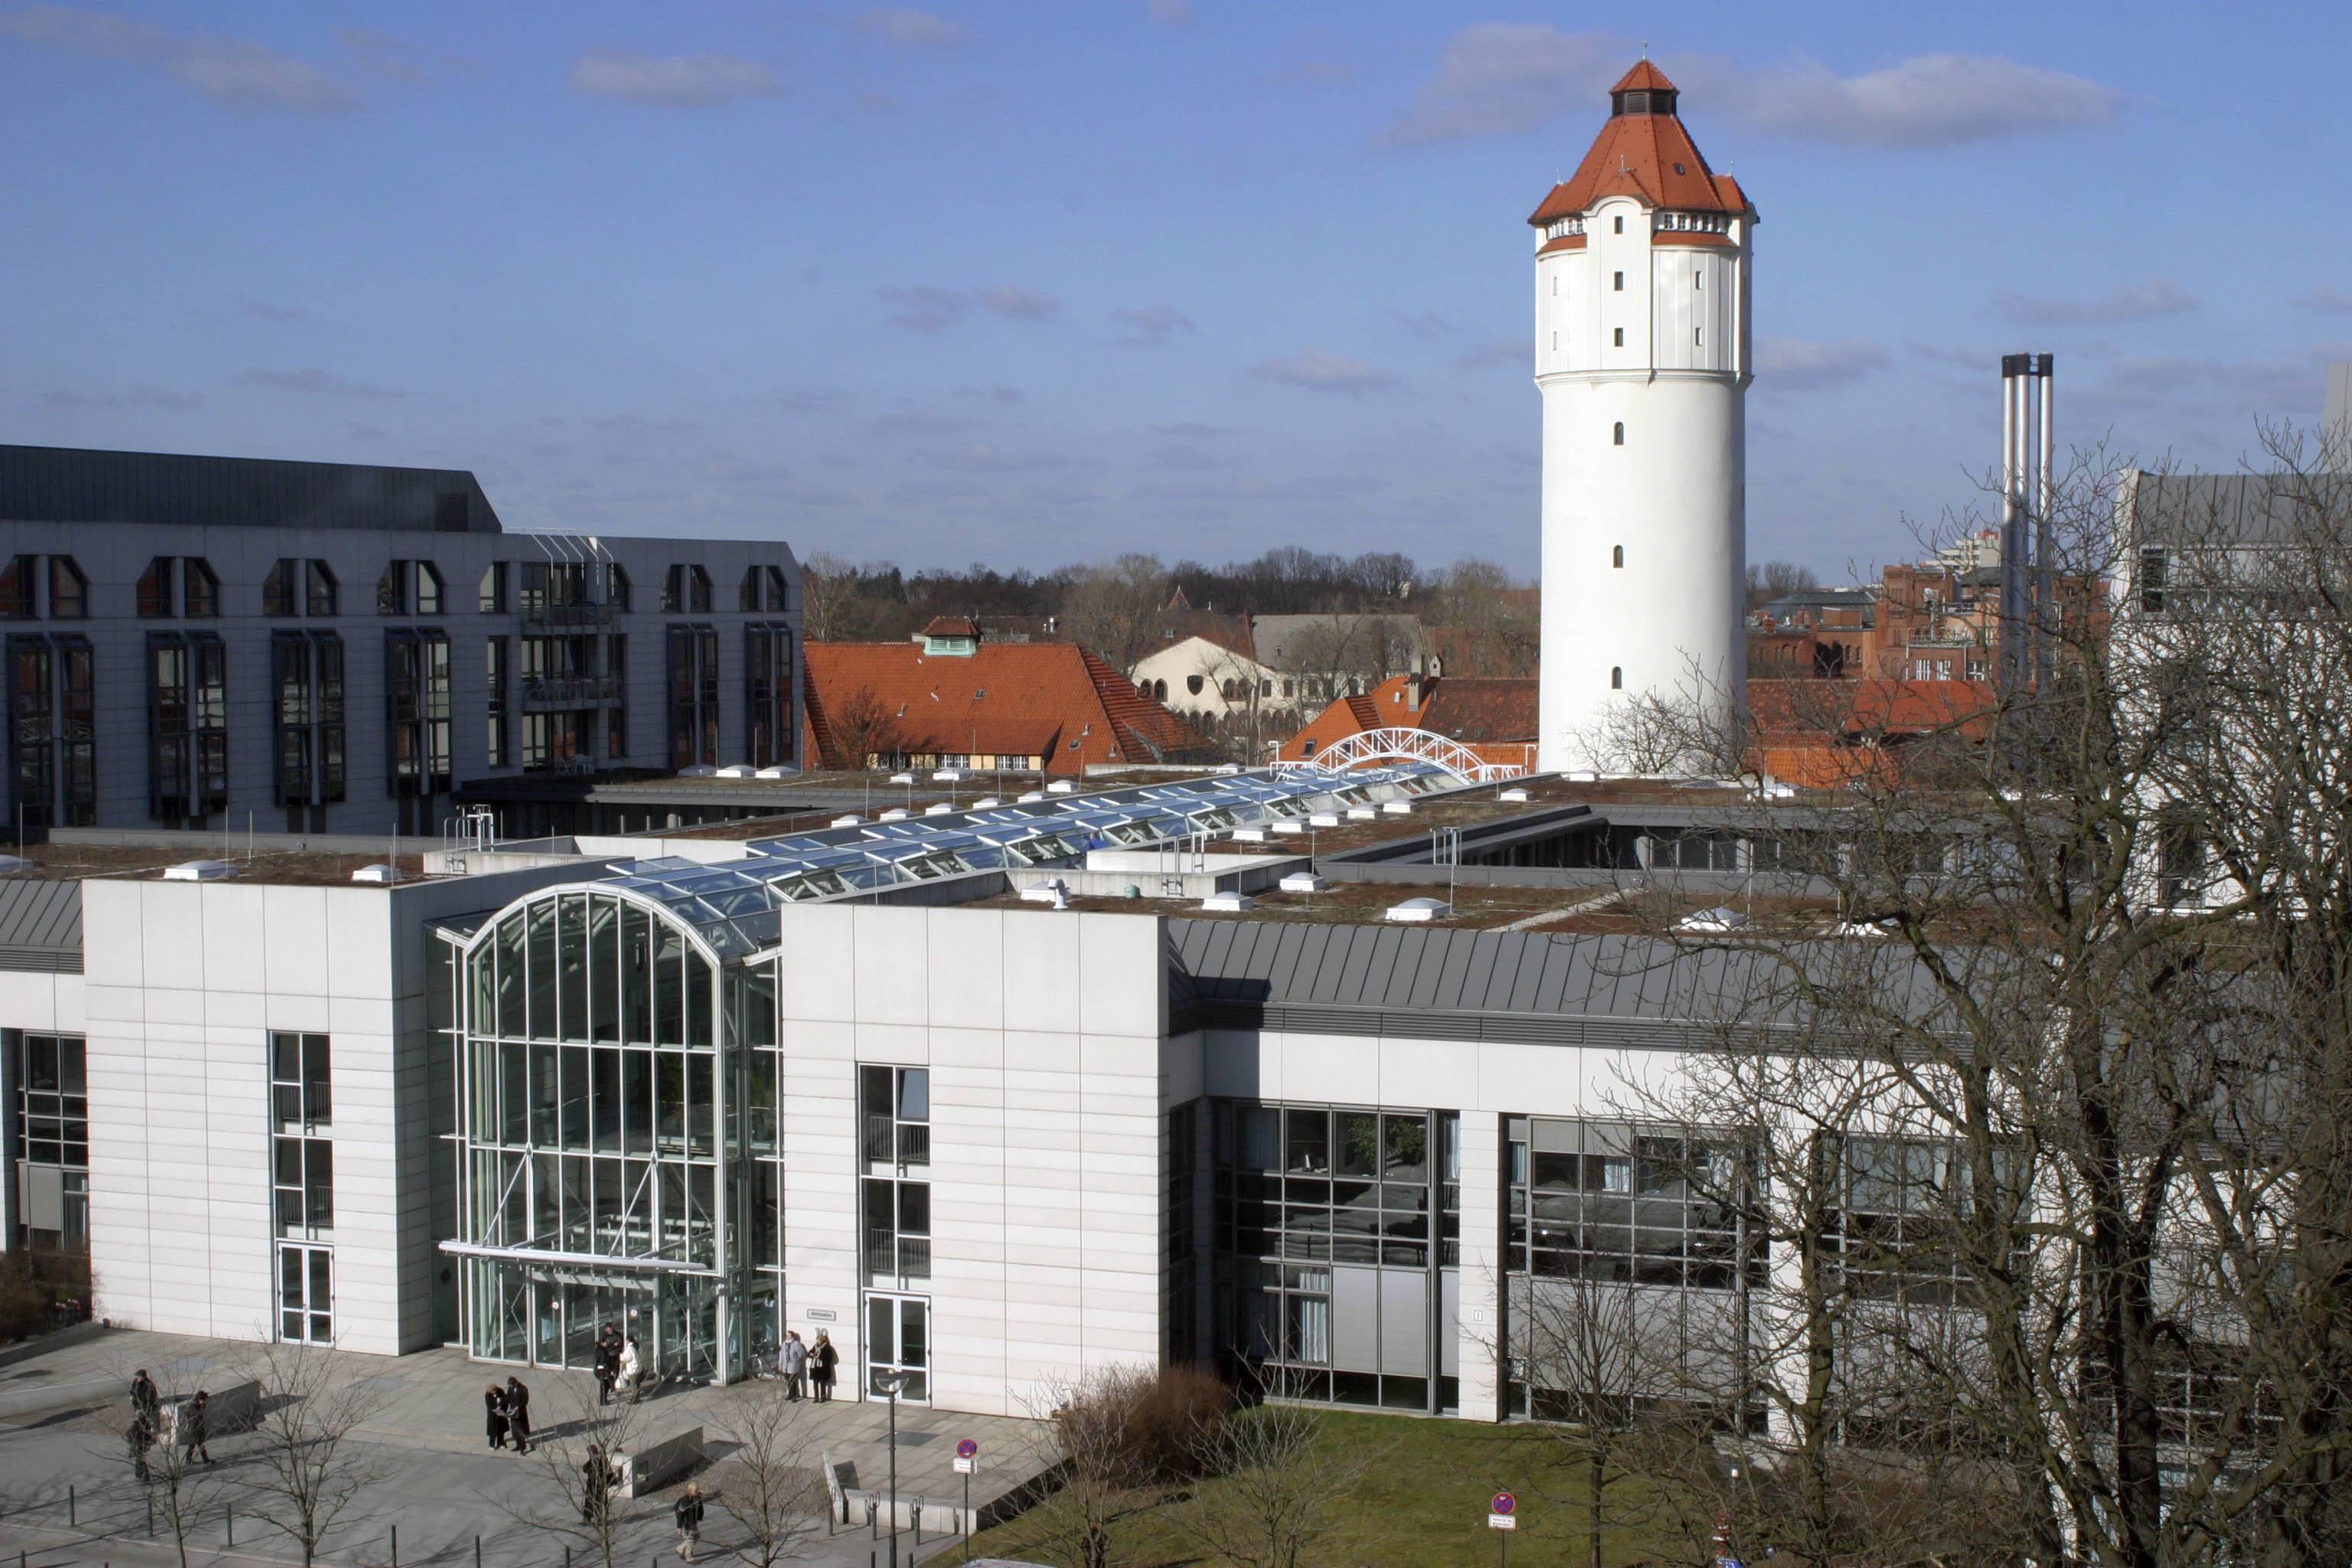 wo in deutschland medizin studieren studiblog